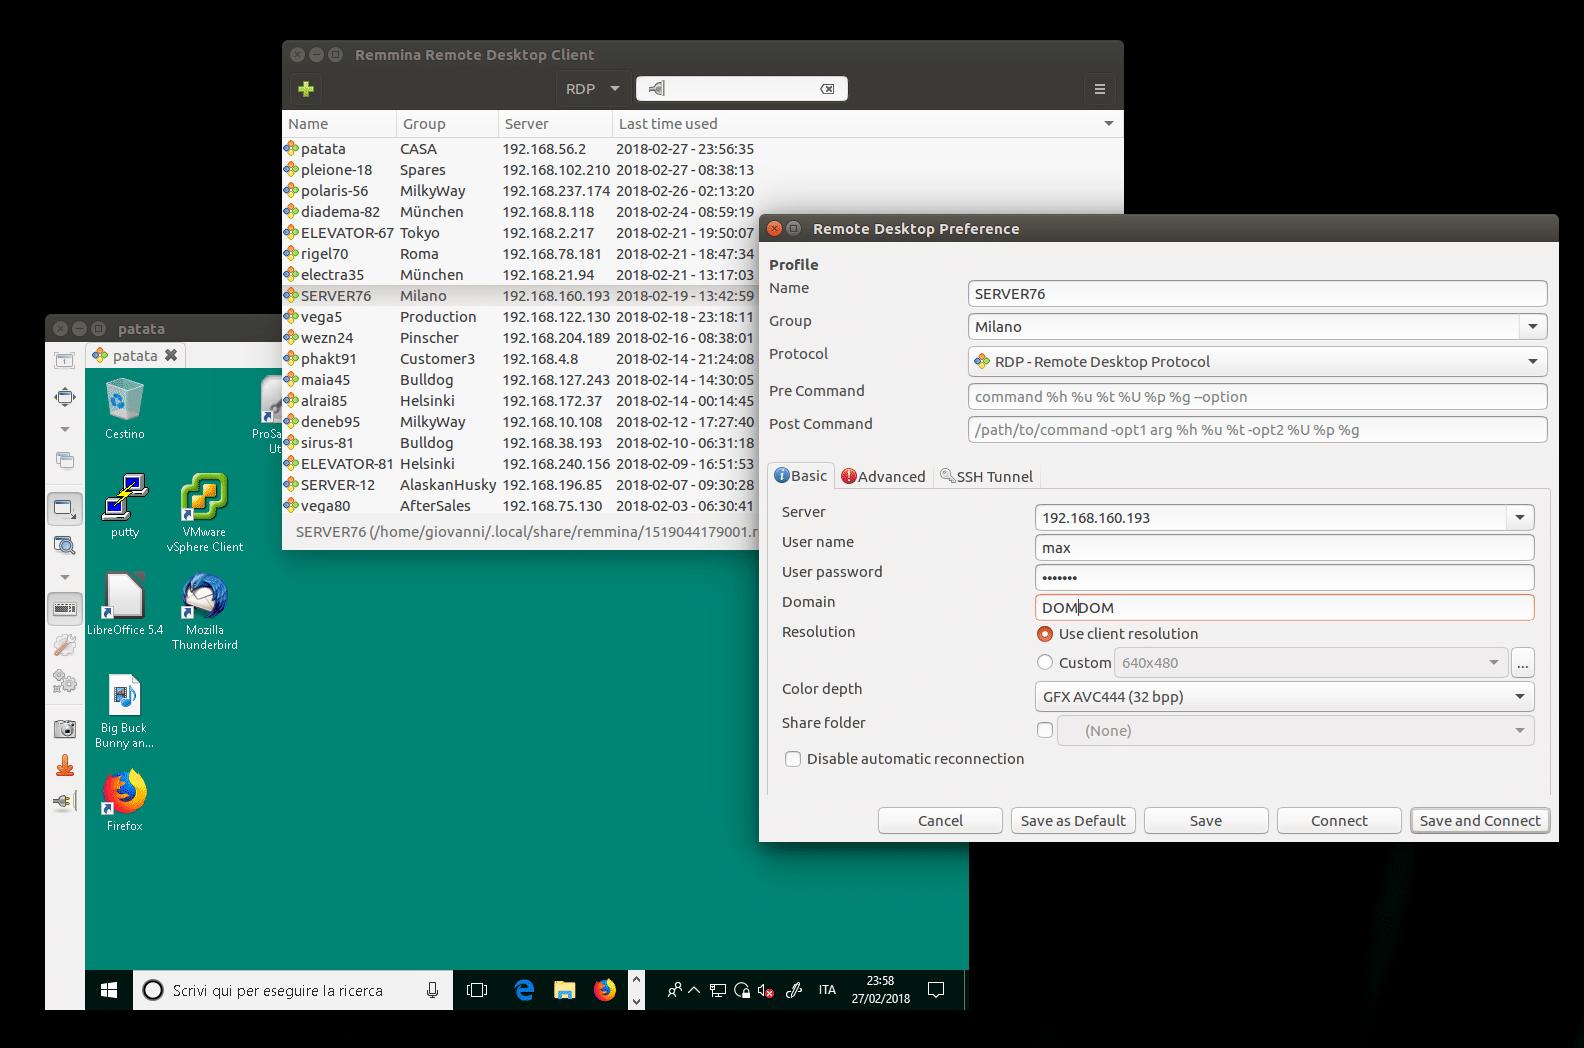 Como instalar o Remmina no Ubuntu, Fedora, openSUSE